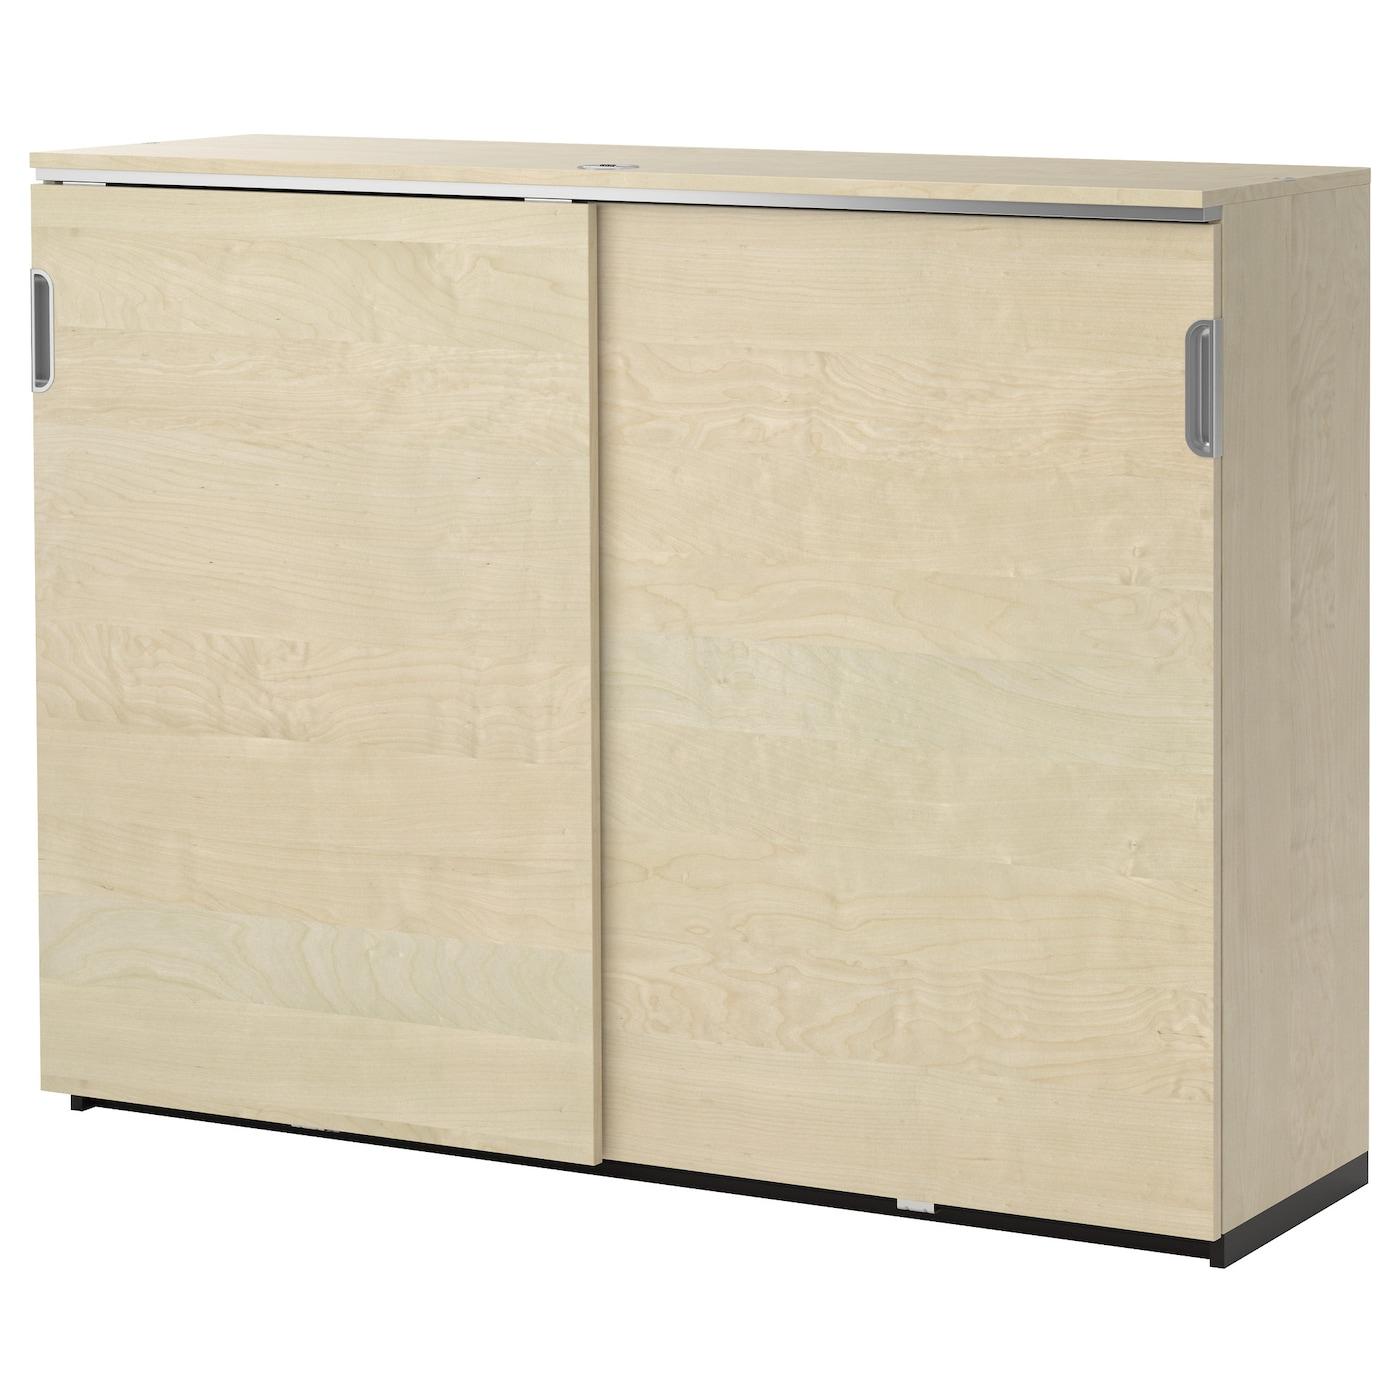 Galant Cabinet With Sliding Doors Birch Veneer 160x120 Cm